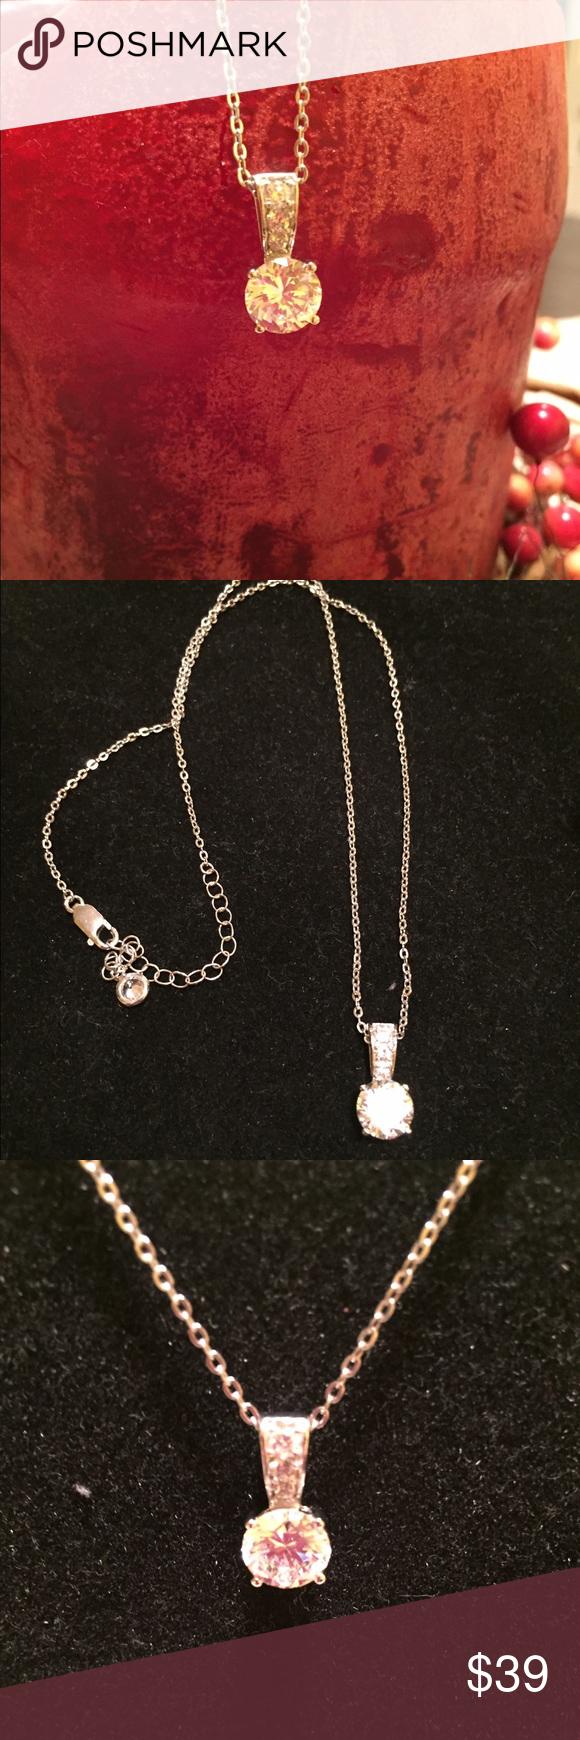 & Costume diamond necklace